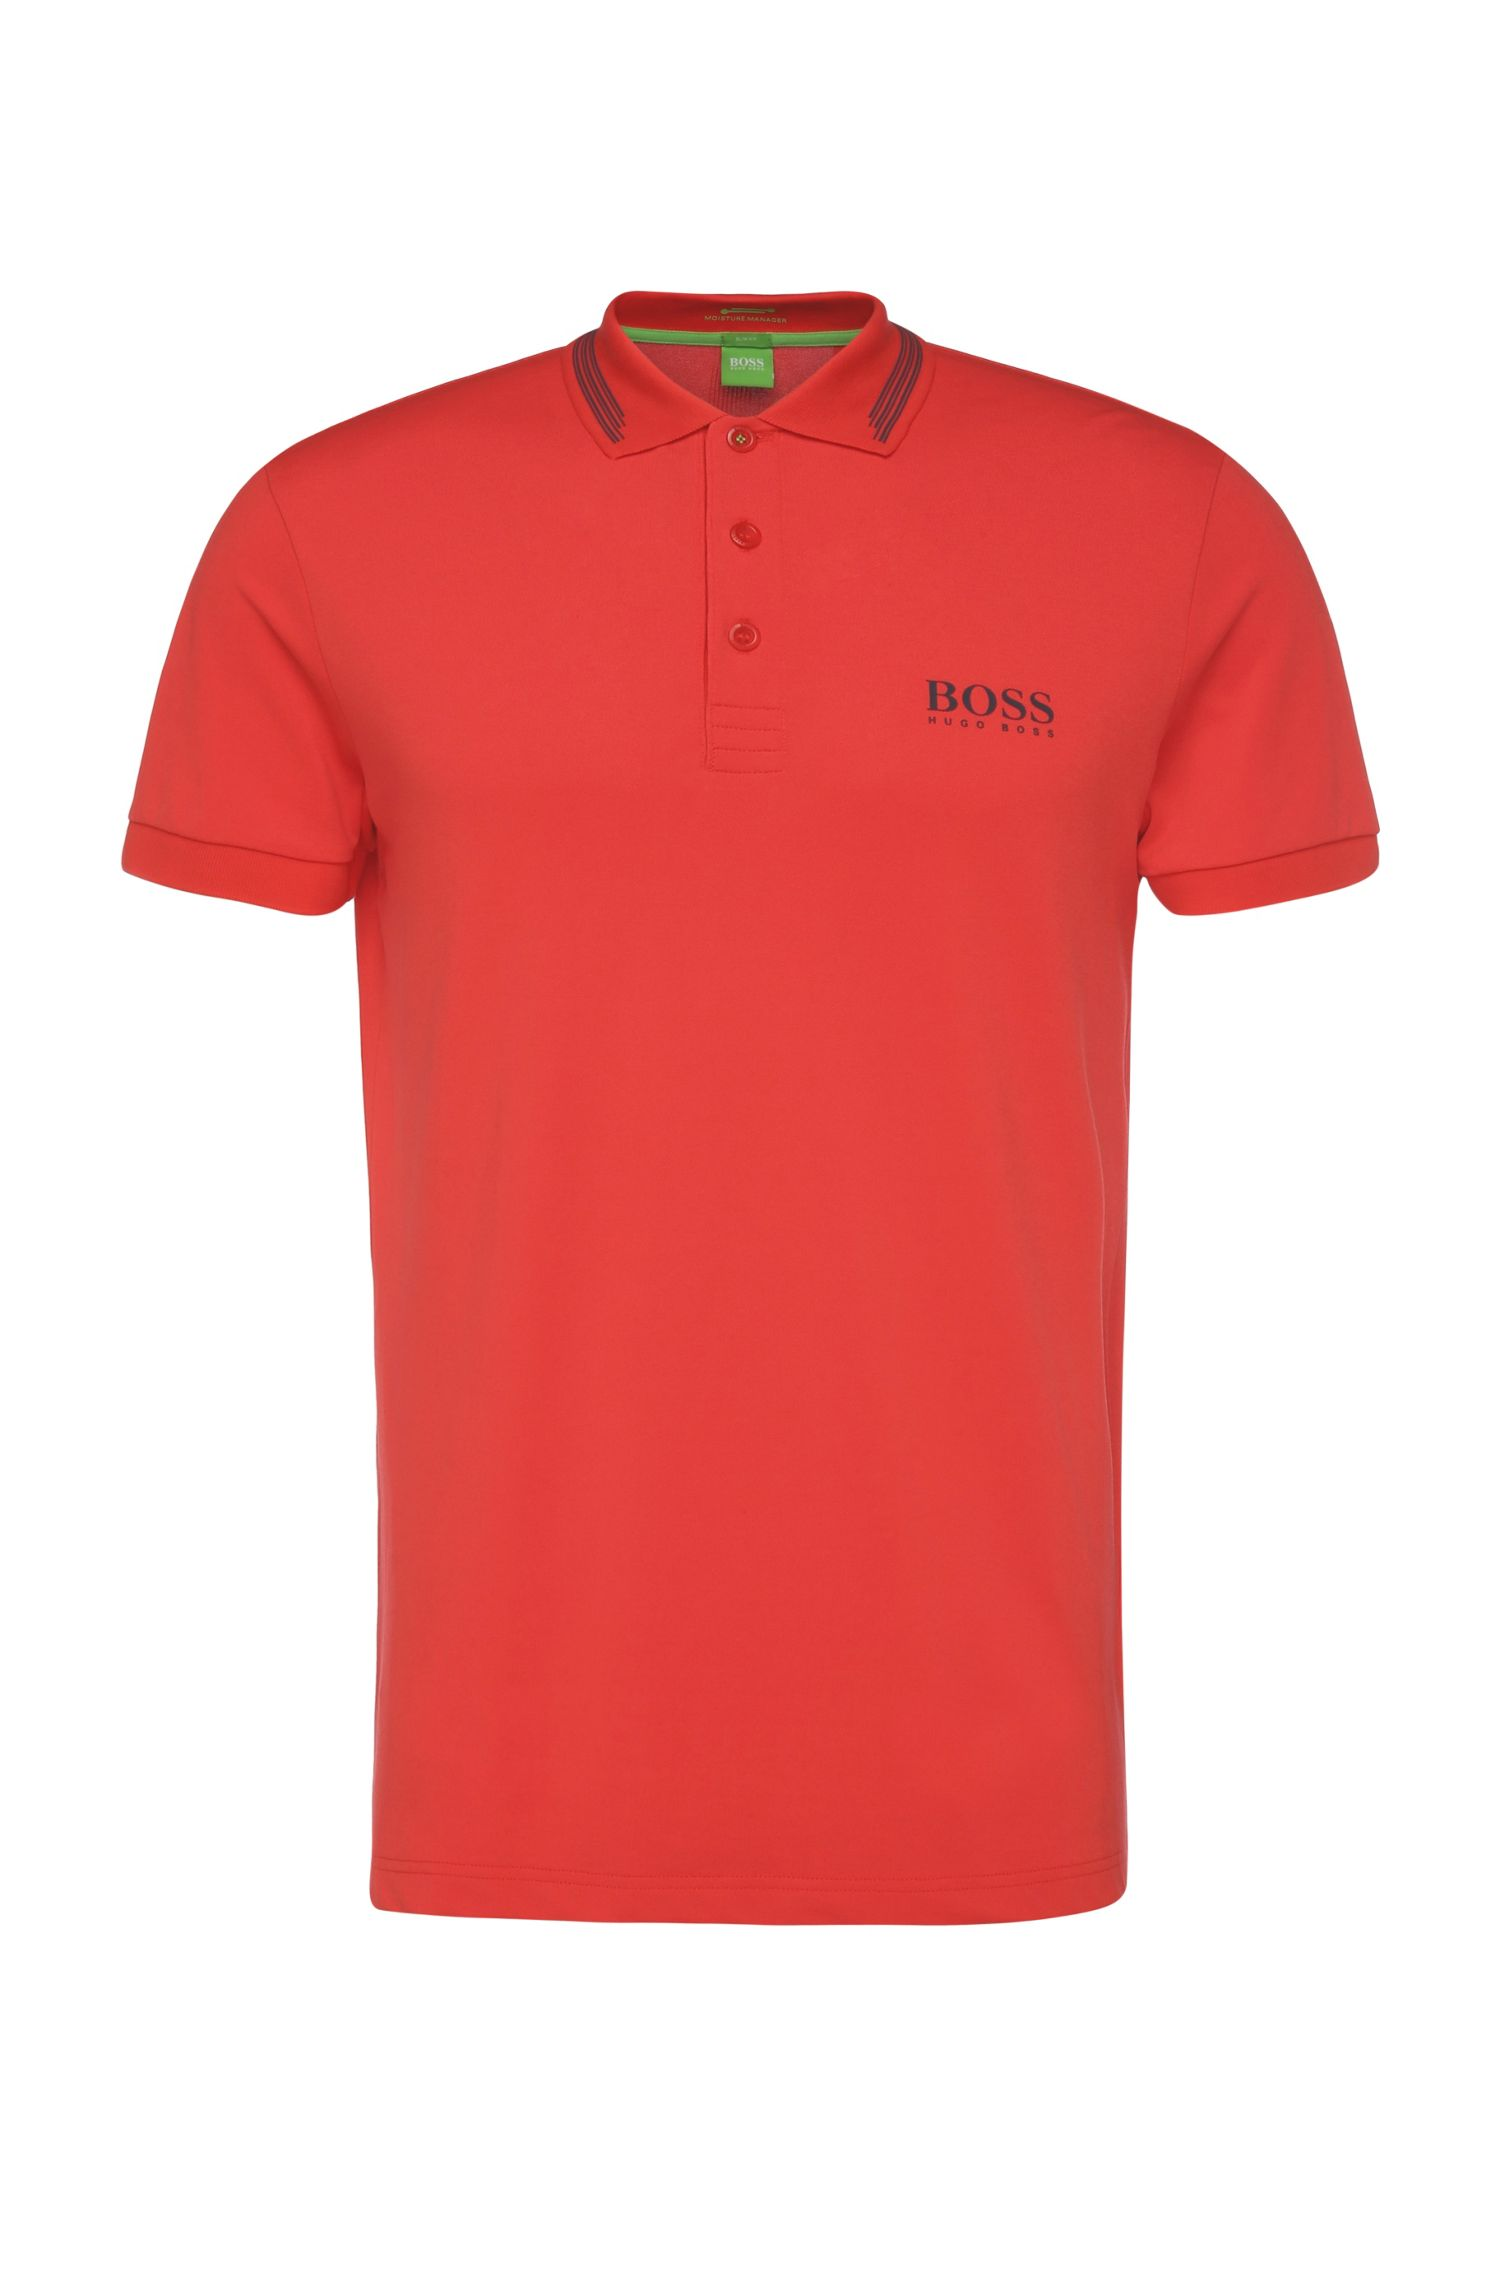 'Paule Pro'   Slim Fit, Moisture Manager Stretch Cotton Blend Polo Shirt